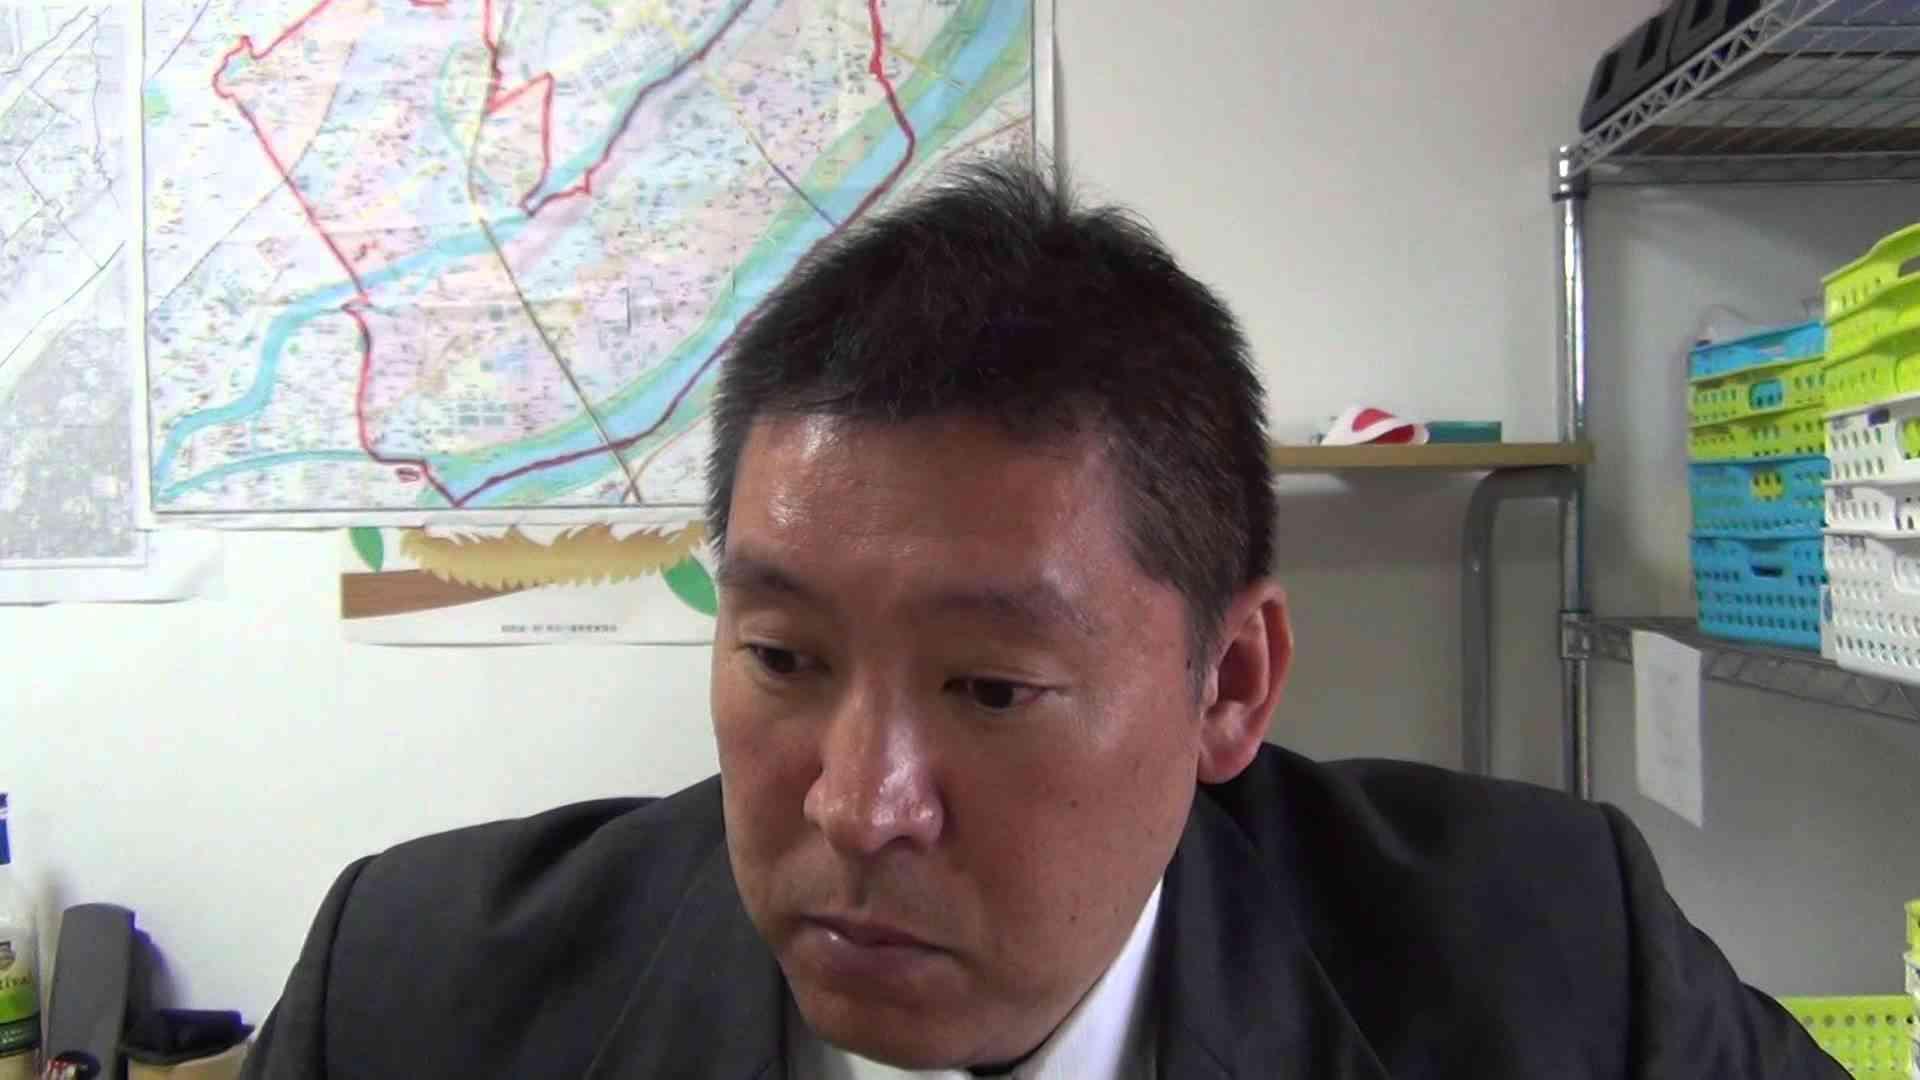 NHK経営委員も受信料払っていない事が発覚 - YouTube